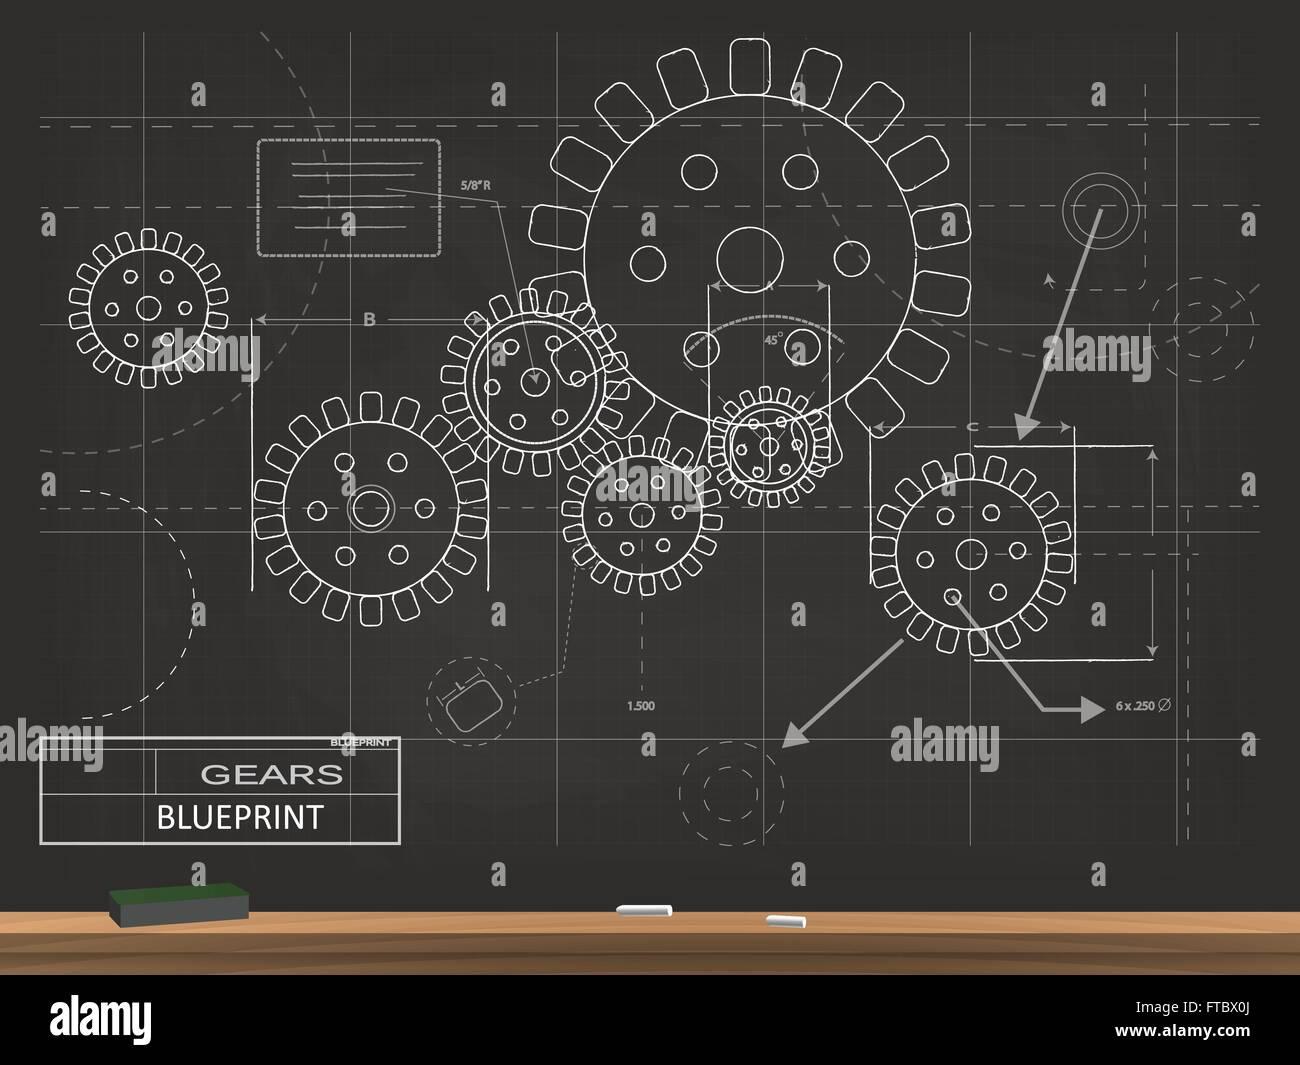 Gears blueprint chalkboard vector illustration stock vector art gears blueprint chalkboard vector illustration malvernweather Choice Image